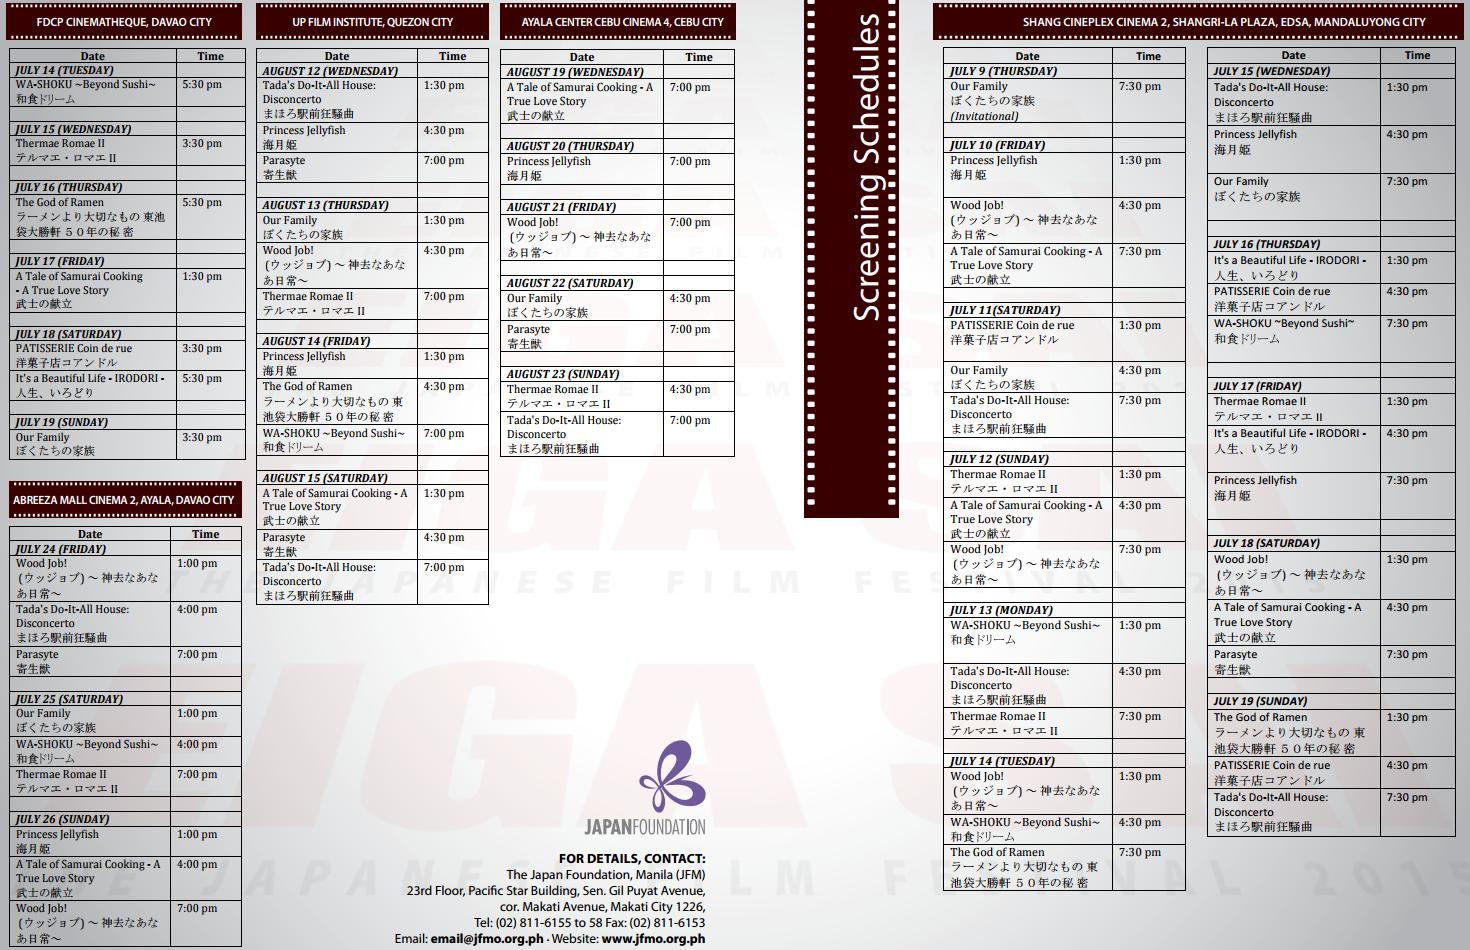 2015 Eiga Sai Japanese Film Festival Schedule